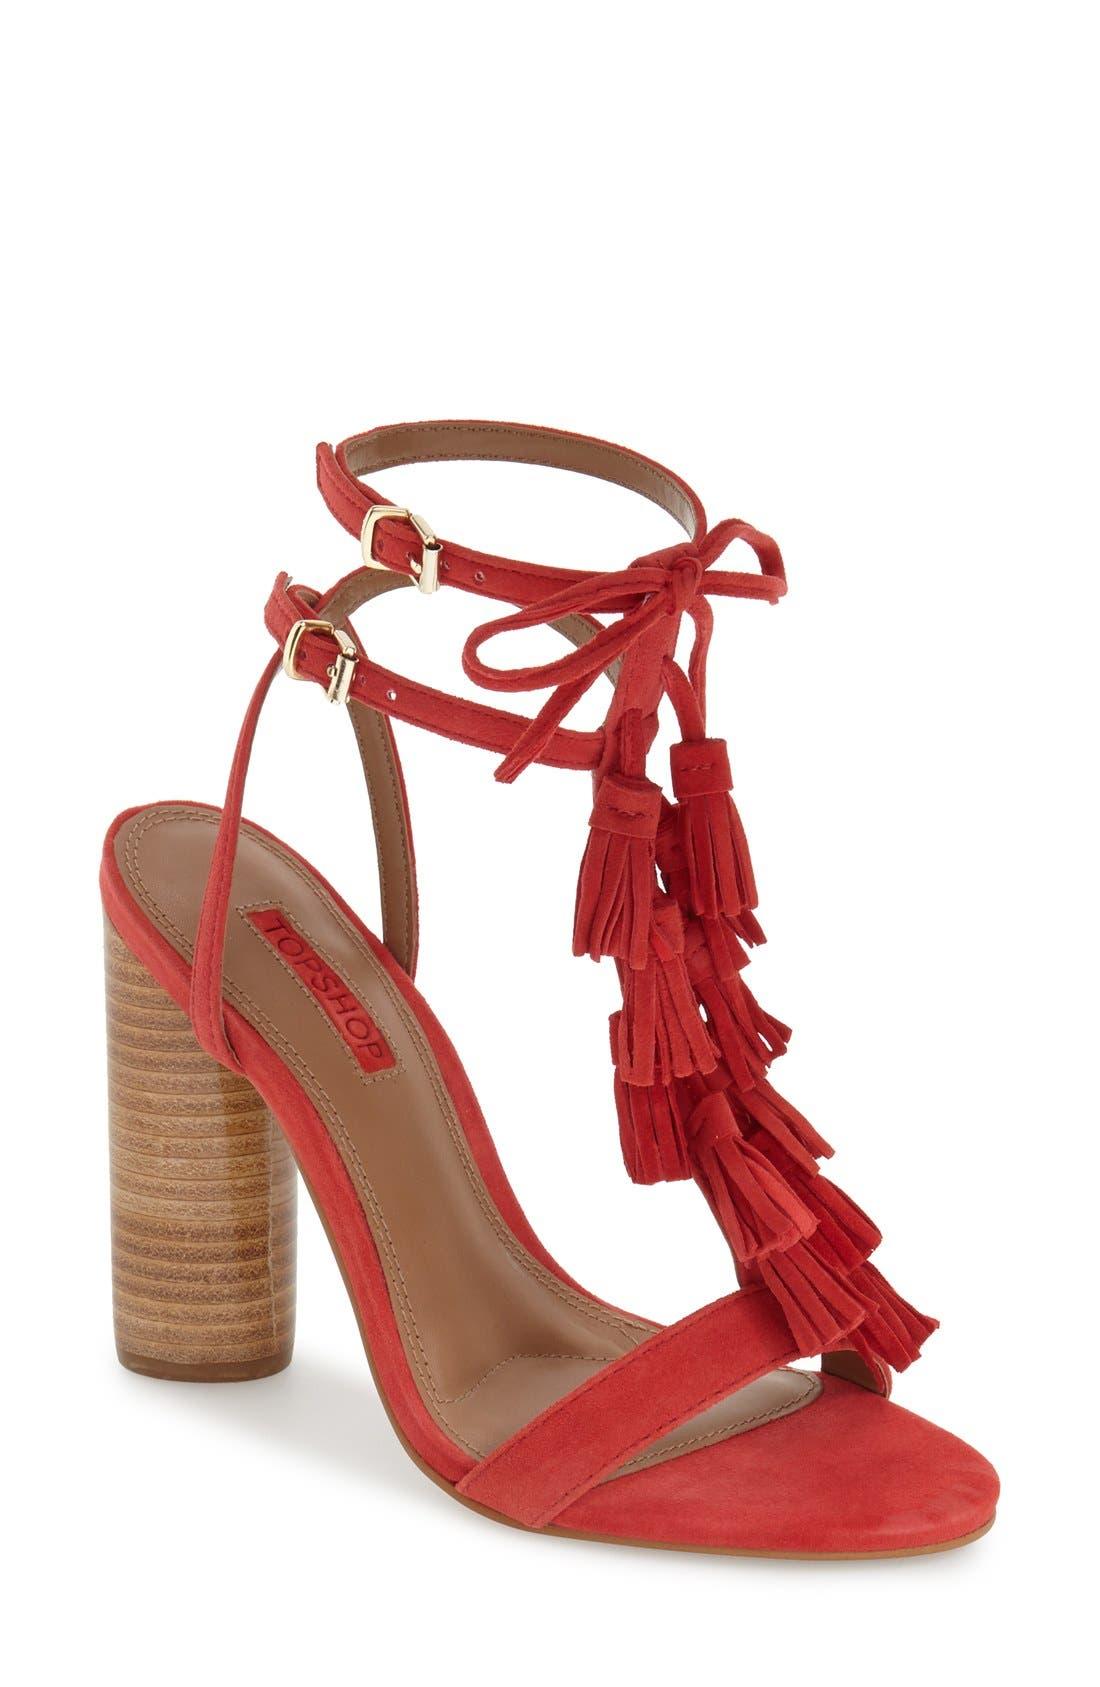 Alternate Image 1 Selected - Topshop 'Ripple' Tasseled Round Heel Sandal (Women)